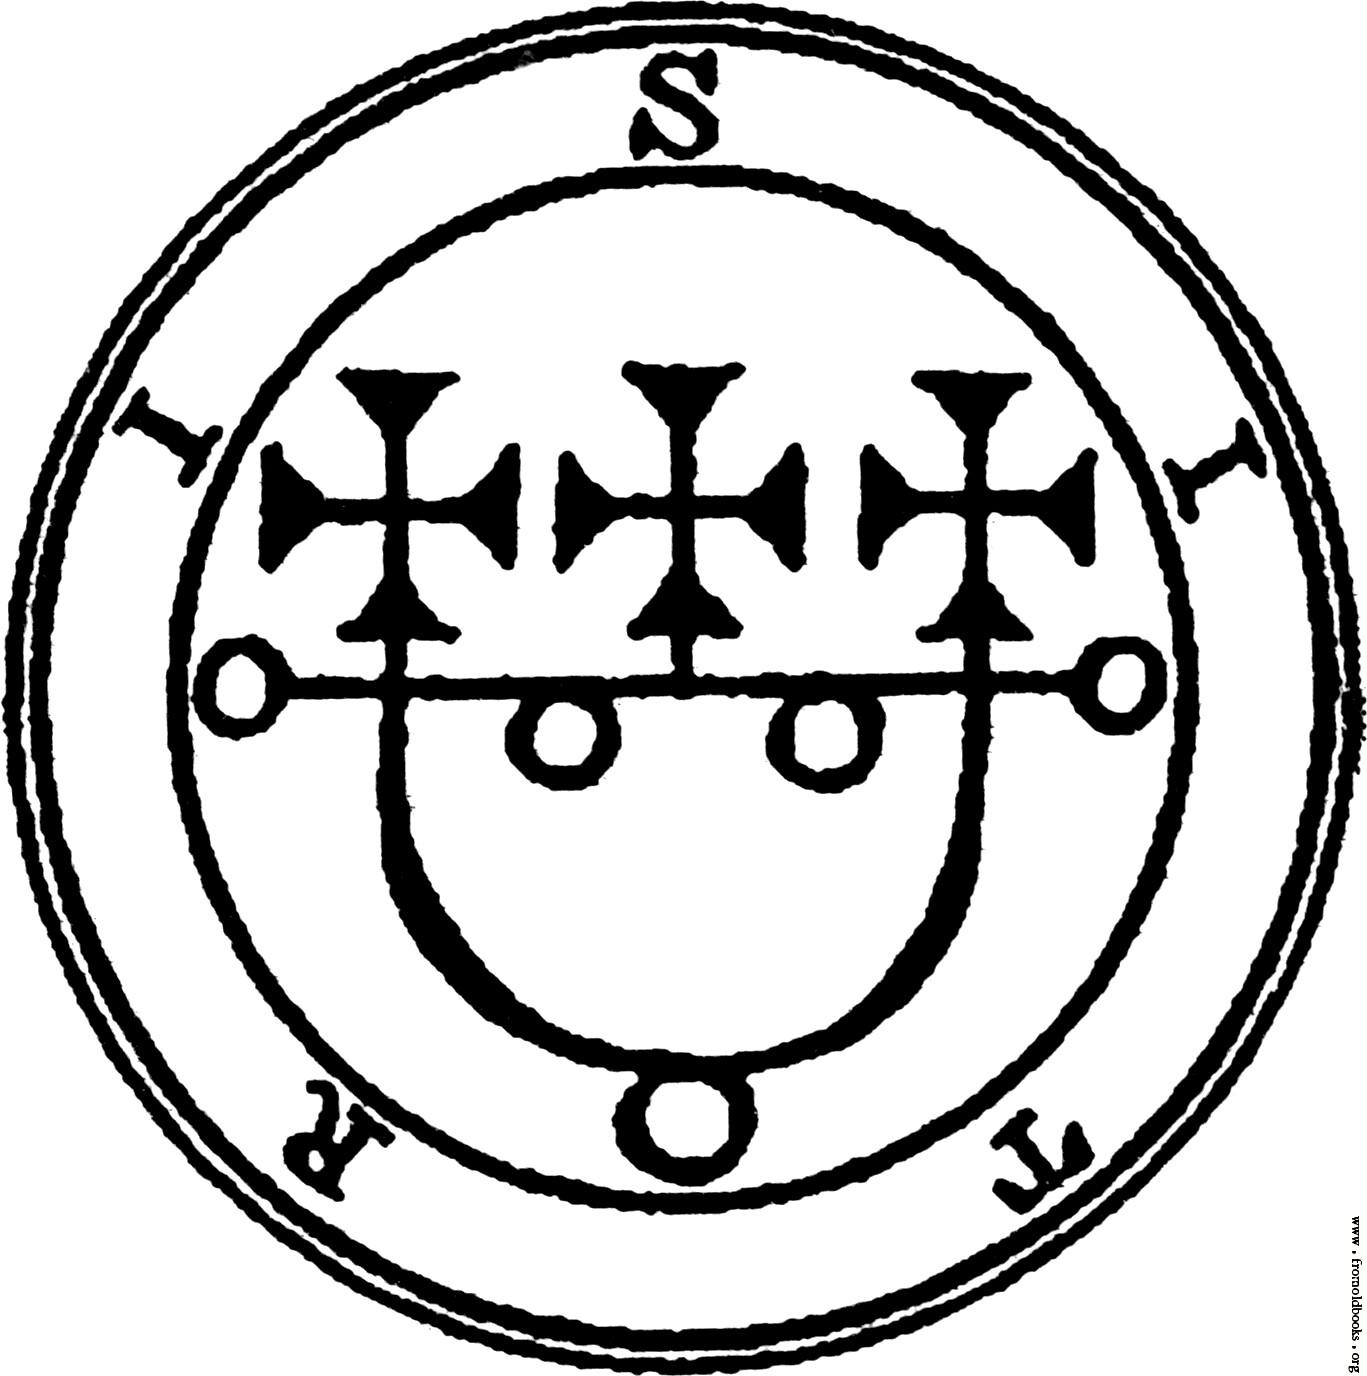 012-seal-of-sitri-q100-1367x1376